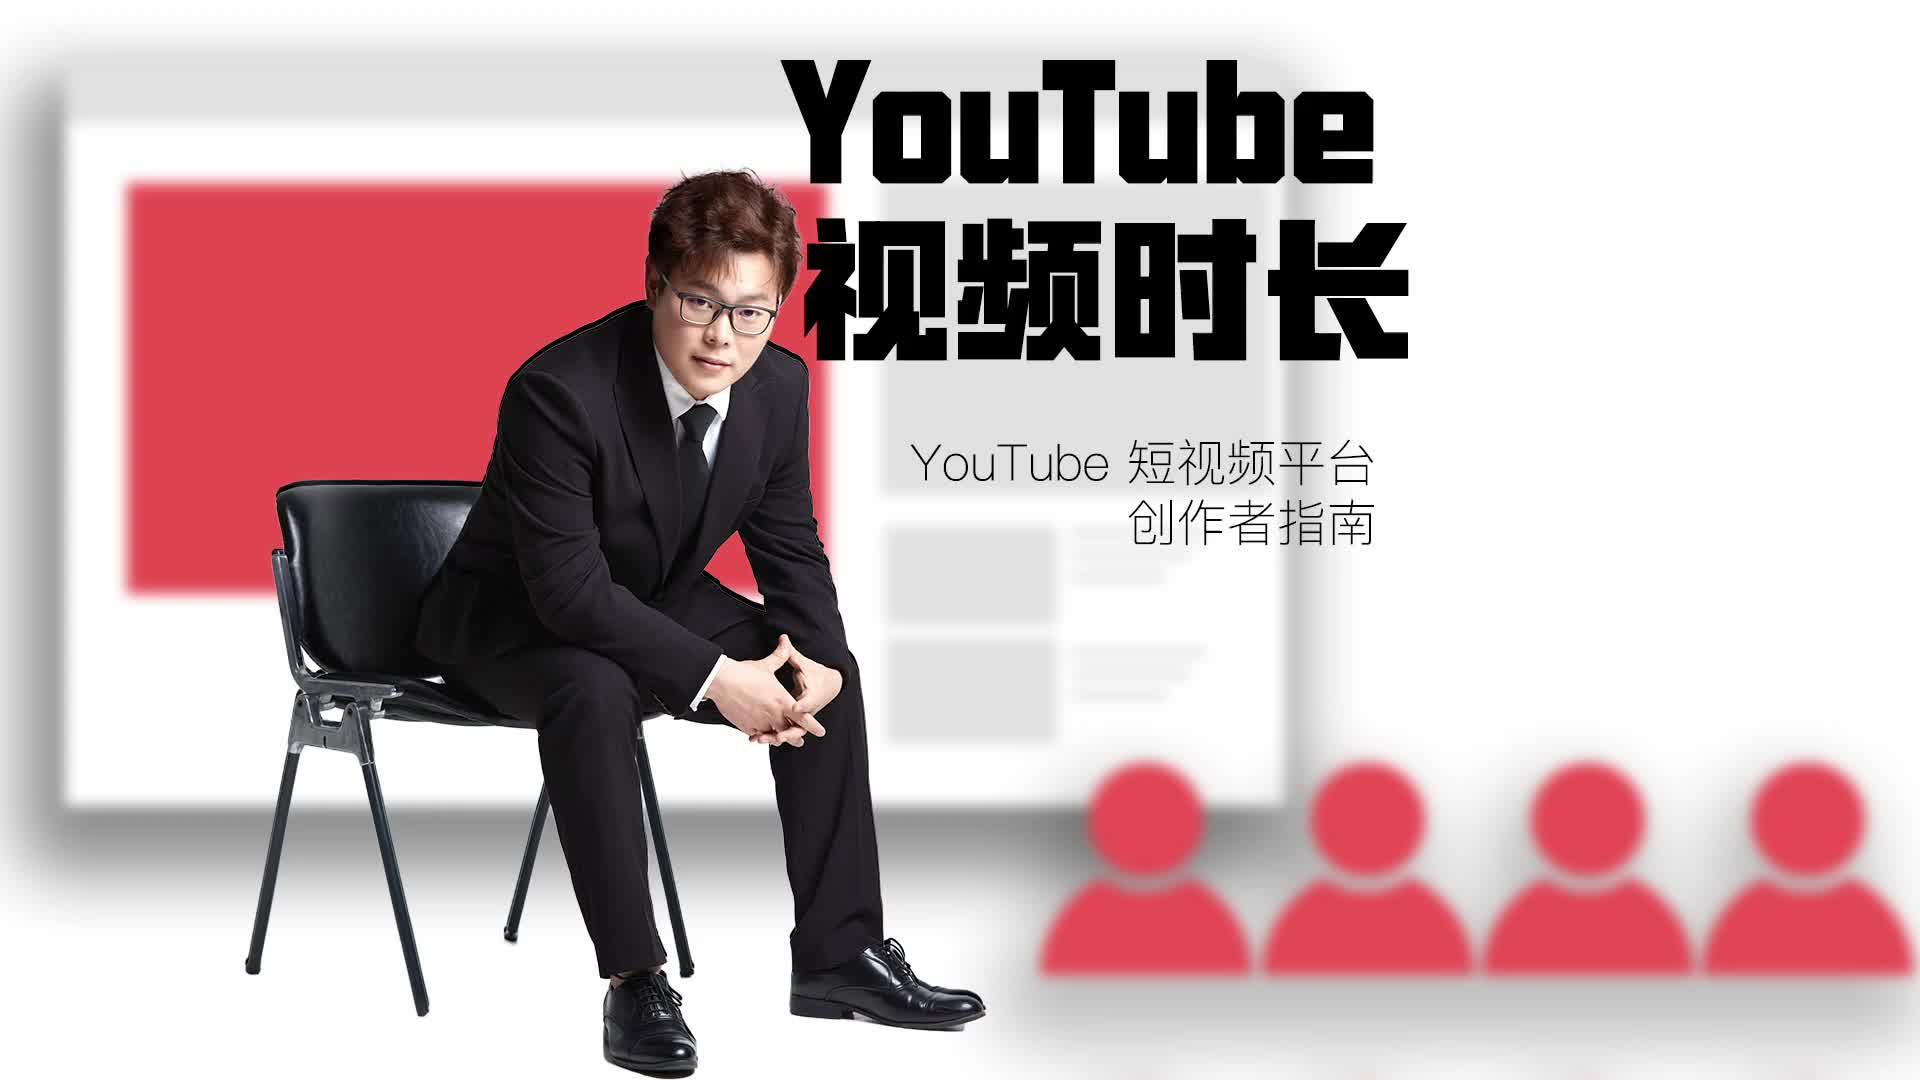 YouTube时长 YouTube算法更青睐较长的视频吗?